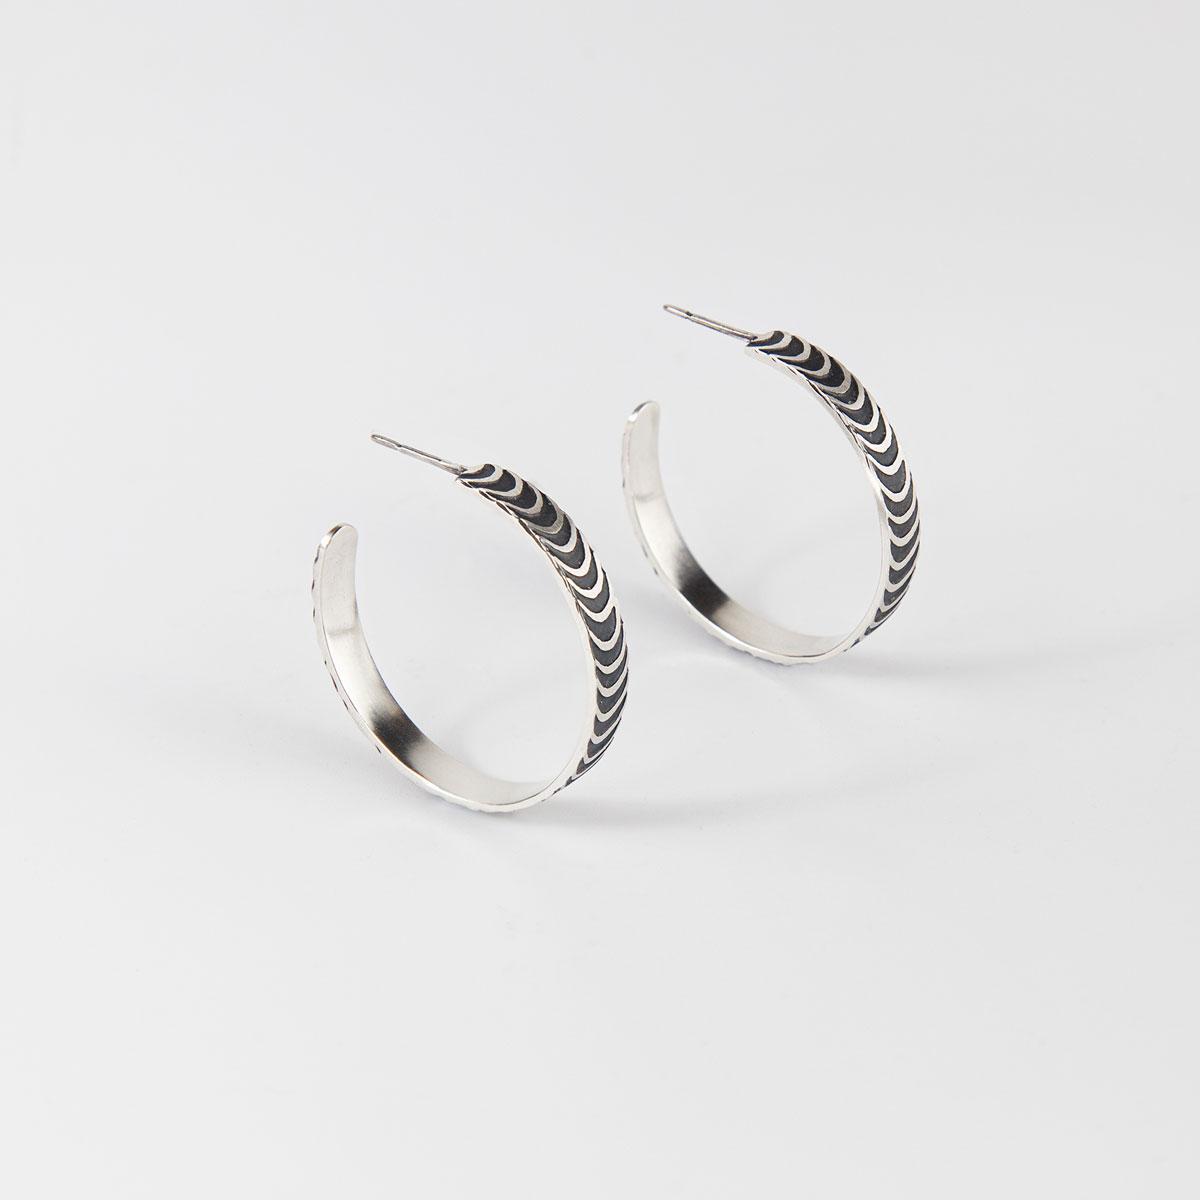 'Finesse' Silver and Black Hoop Earrings, Large